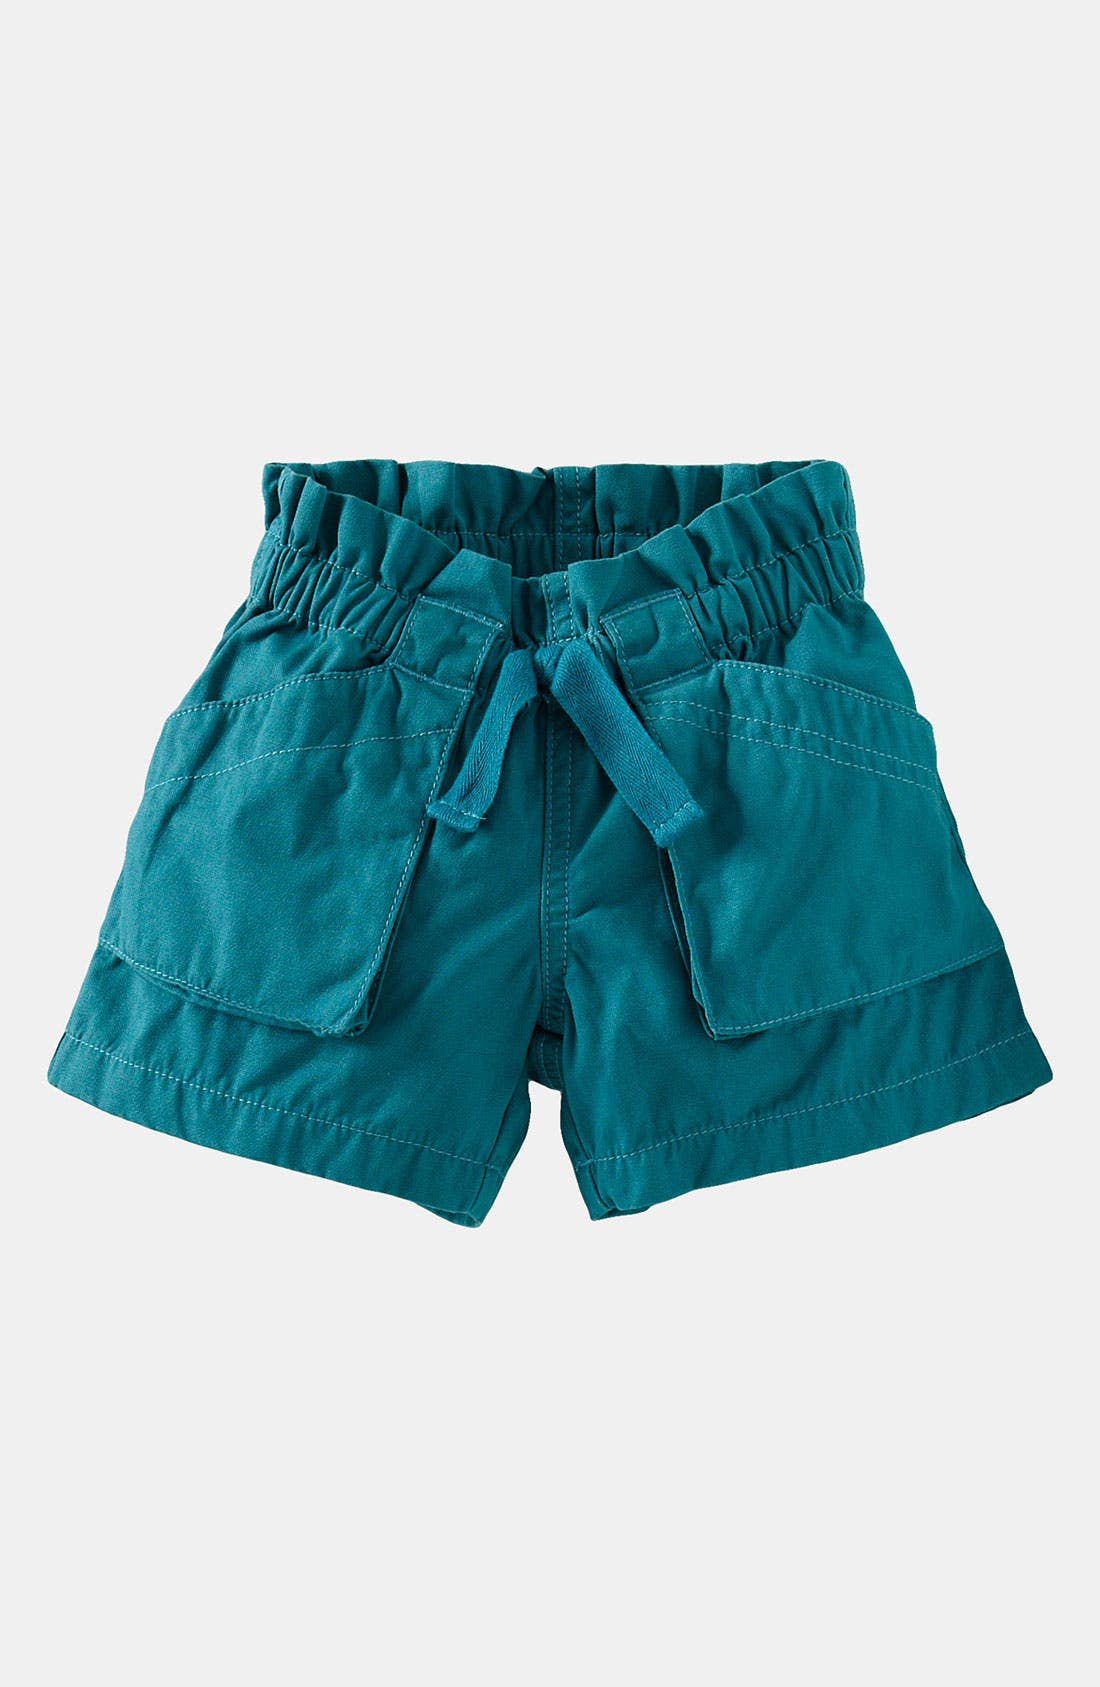 Alternate Image 1 Selected - Tea Collection Utility Shorts (Toddler, Little Girls & Big Girls)